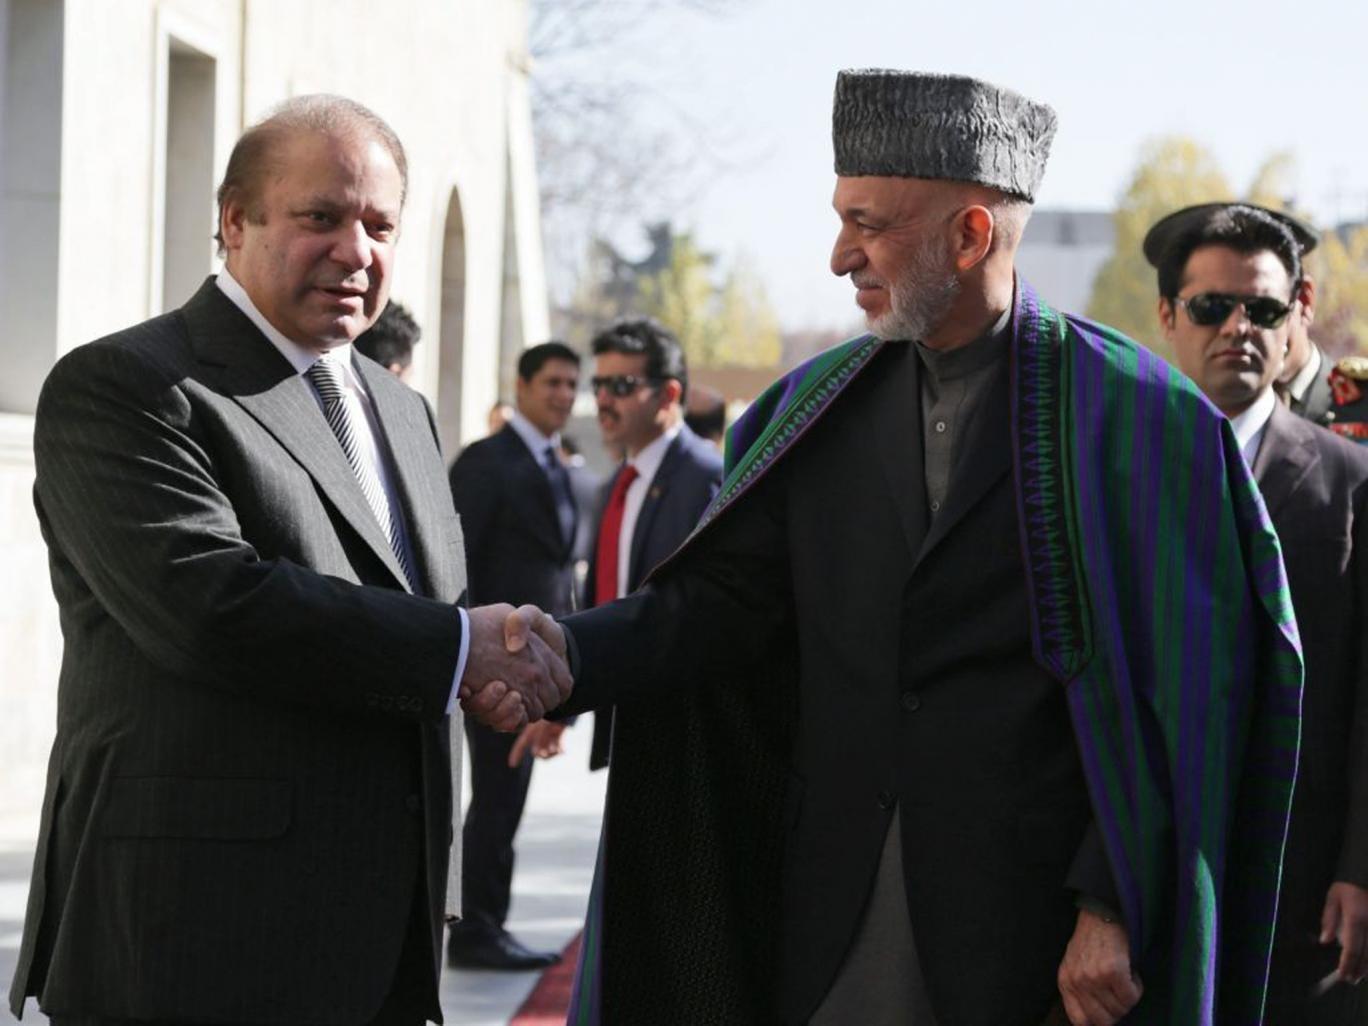 Afghan President Hamid Karzai with Pakistan Prime Minister Nawaz Sharif after talks in Kabul